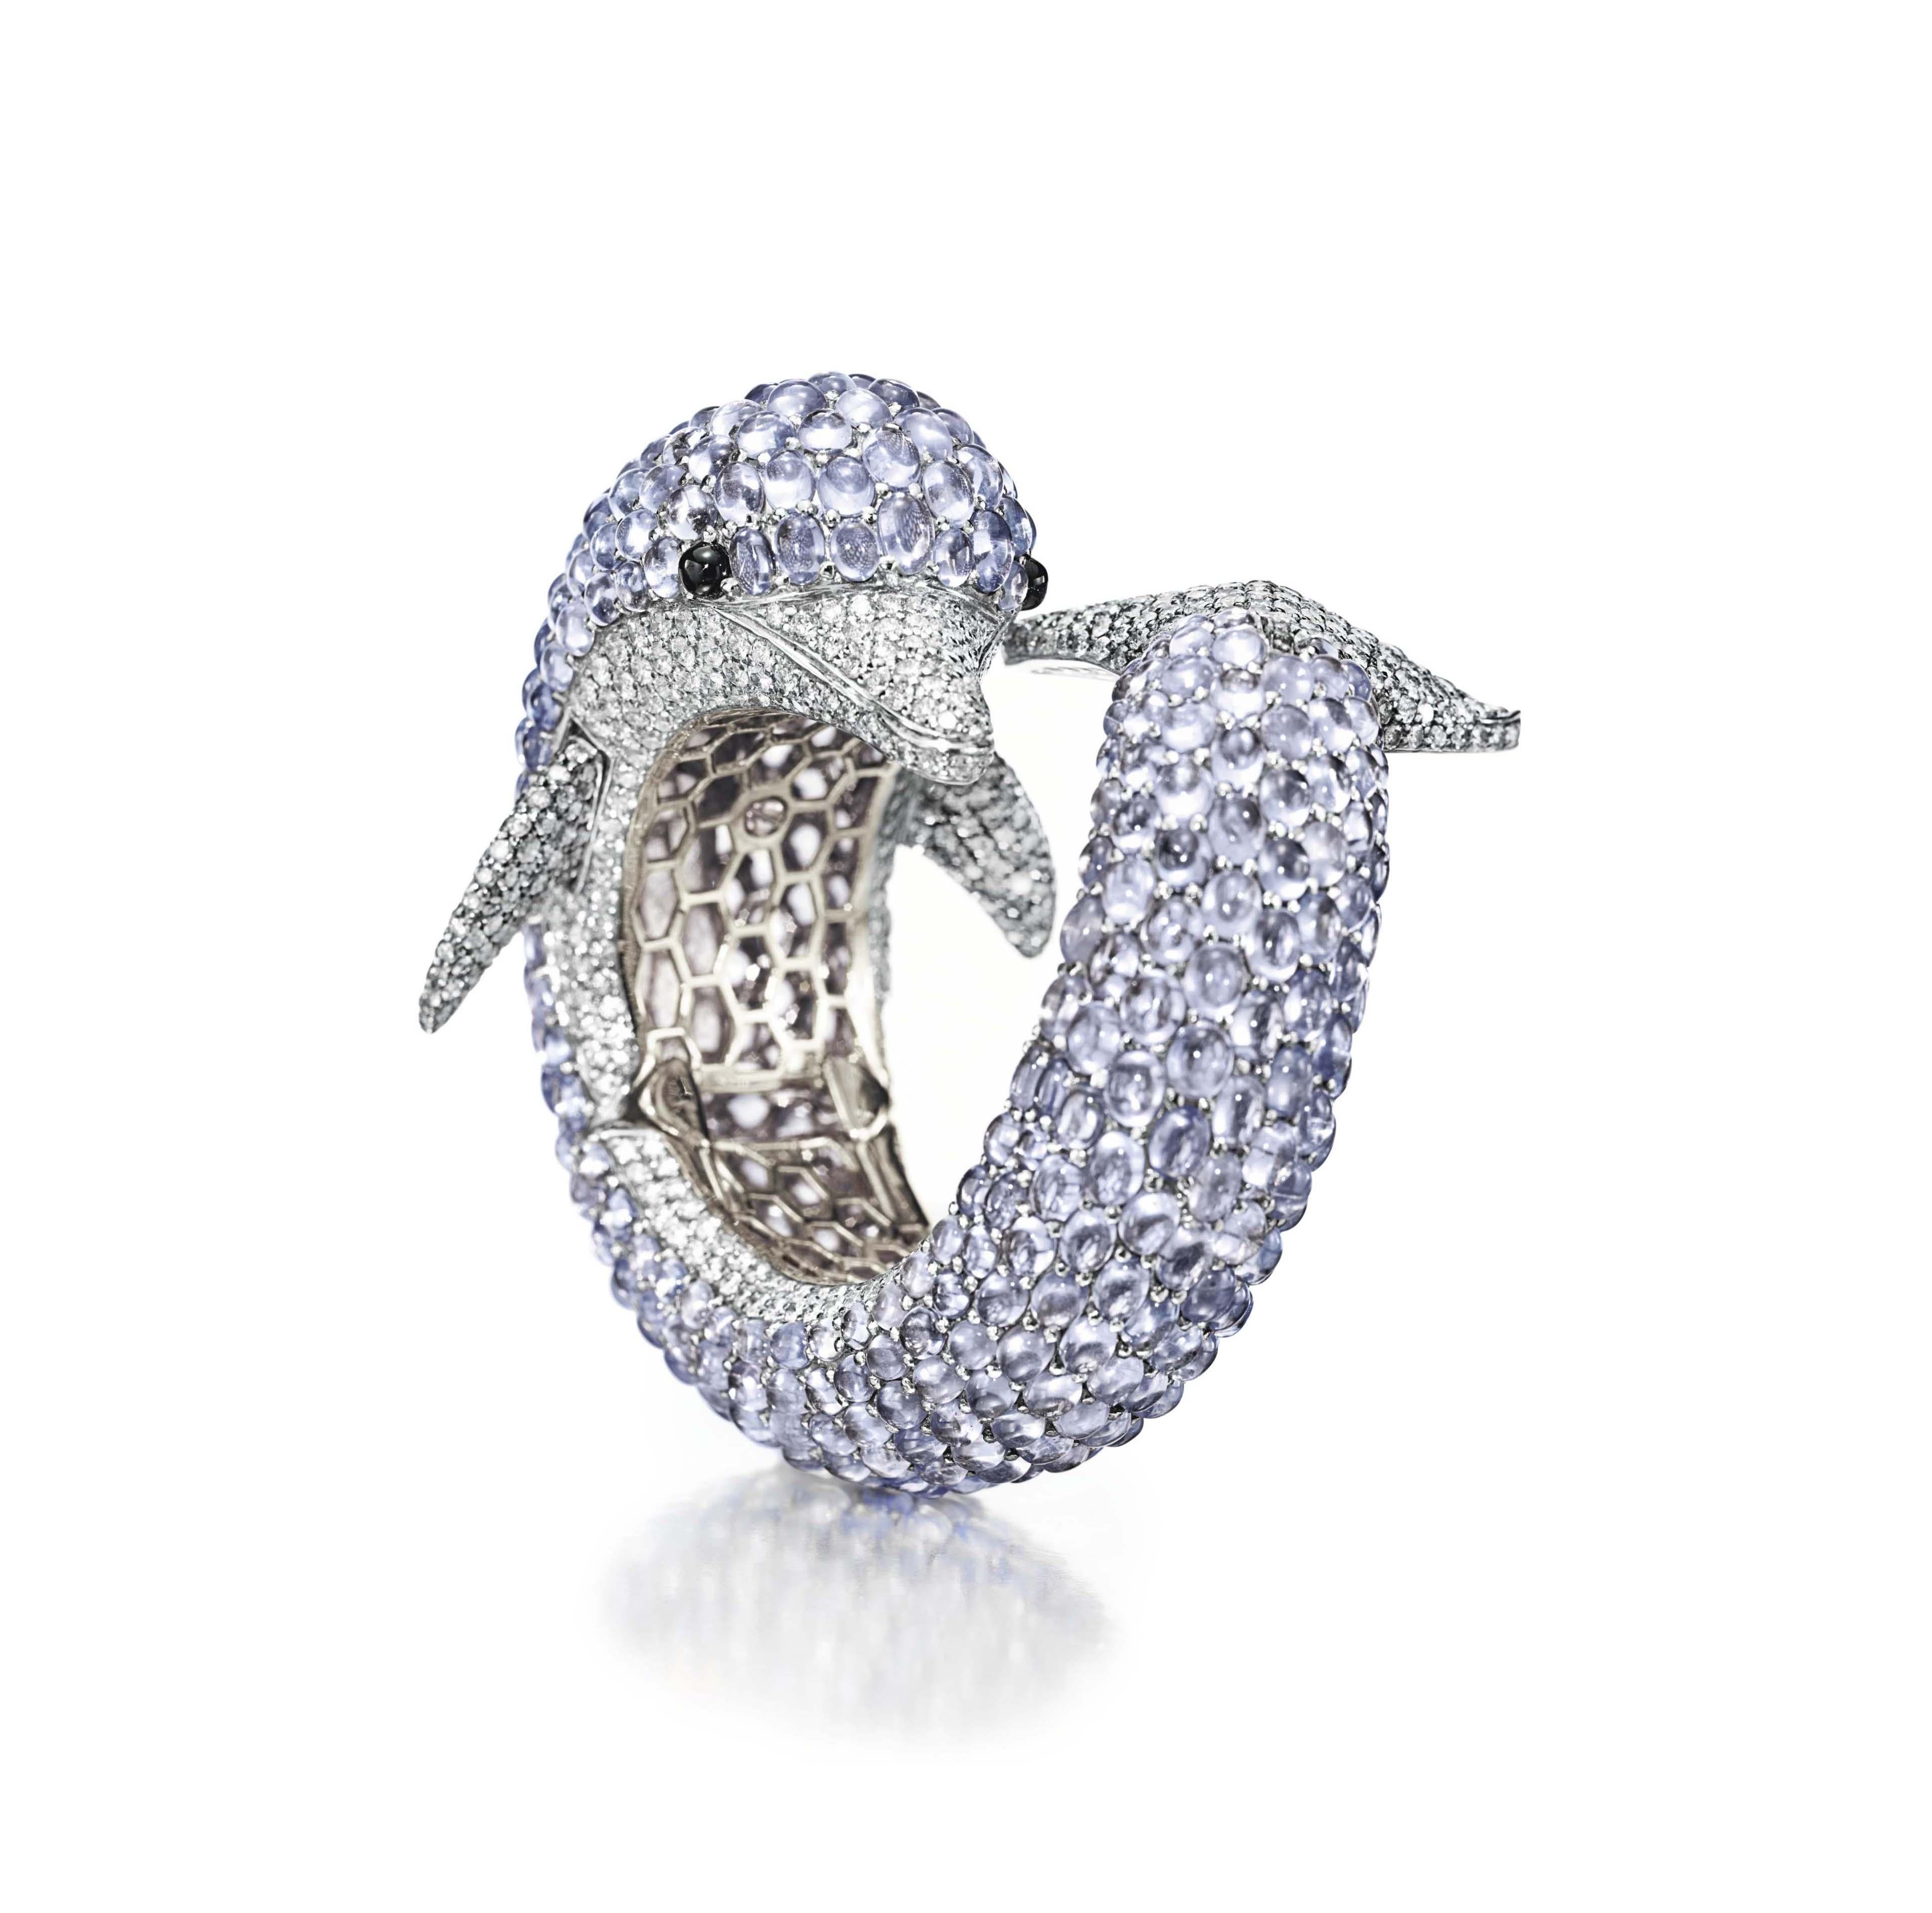 A SAPPHIRE AND DIAMOND BANGLE BRACELET, BY DE GRISOGONO